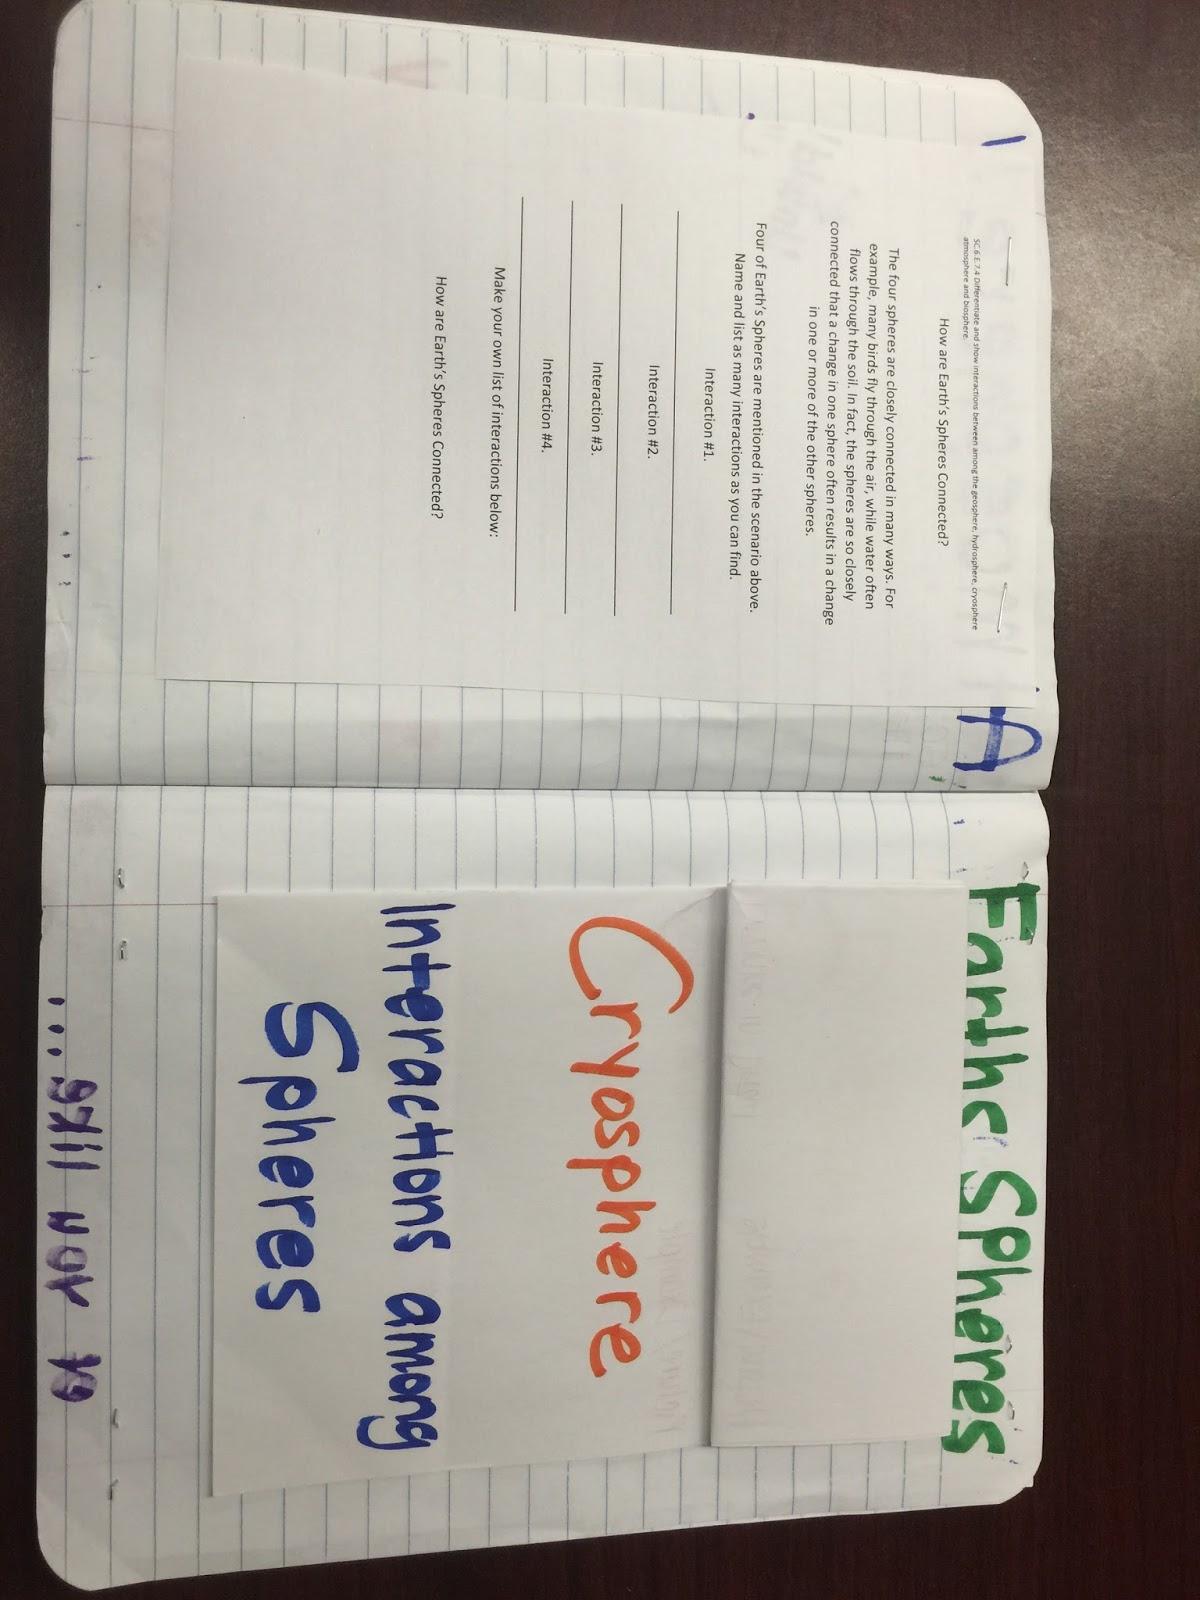 Missinous Science Classroom September